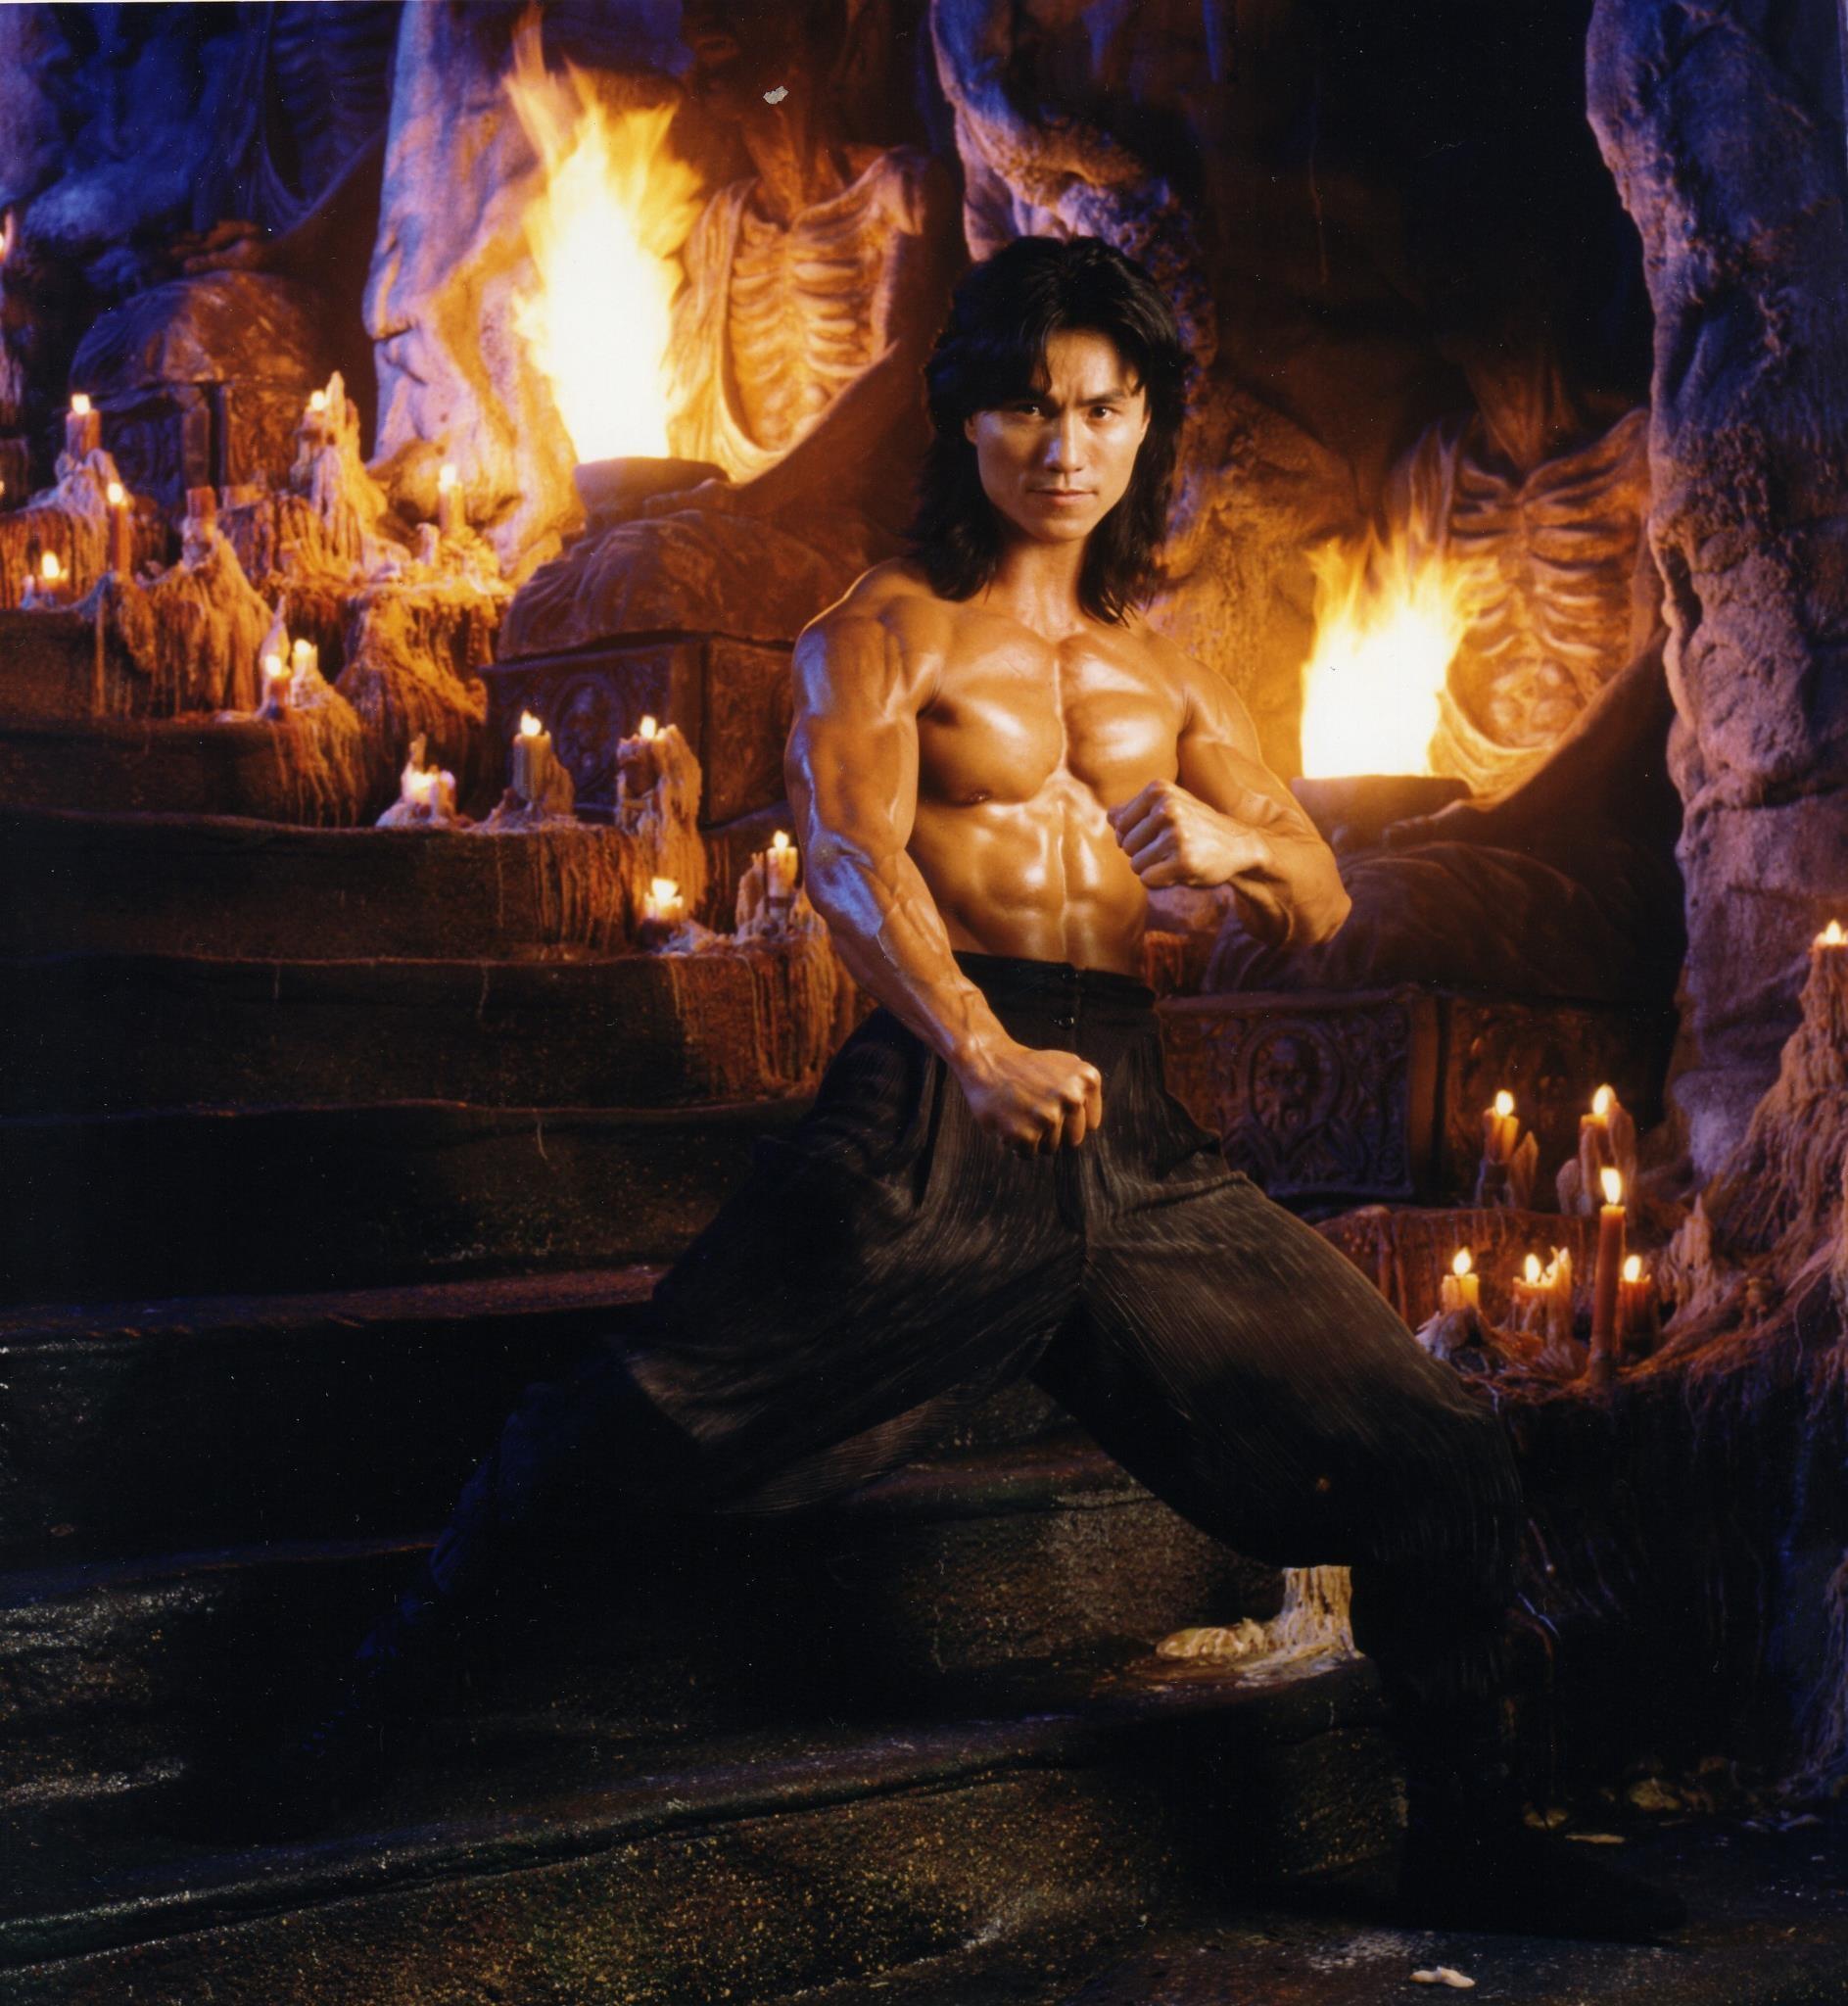 Liu Kang (Mortal Kombat character)